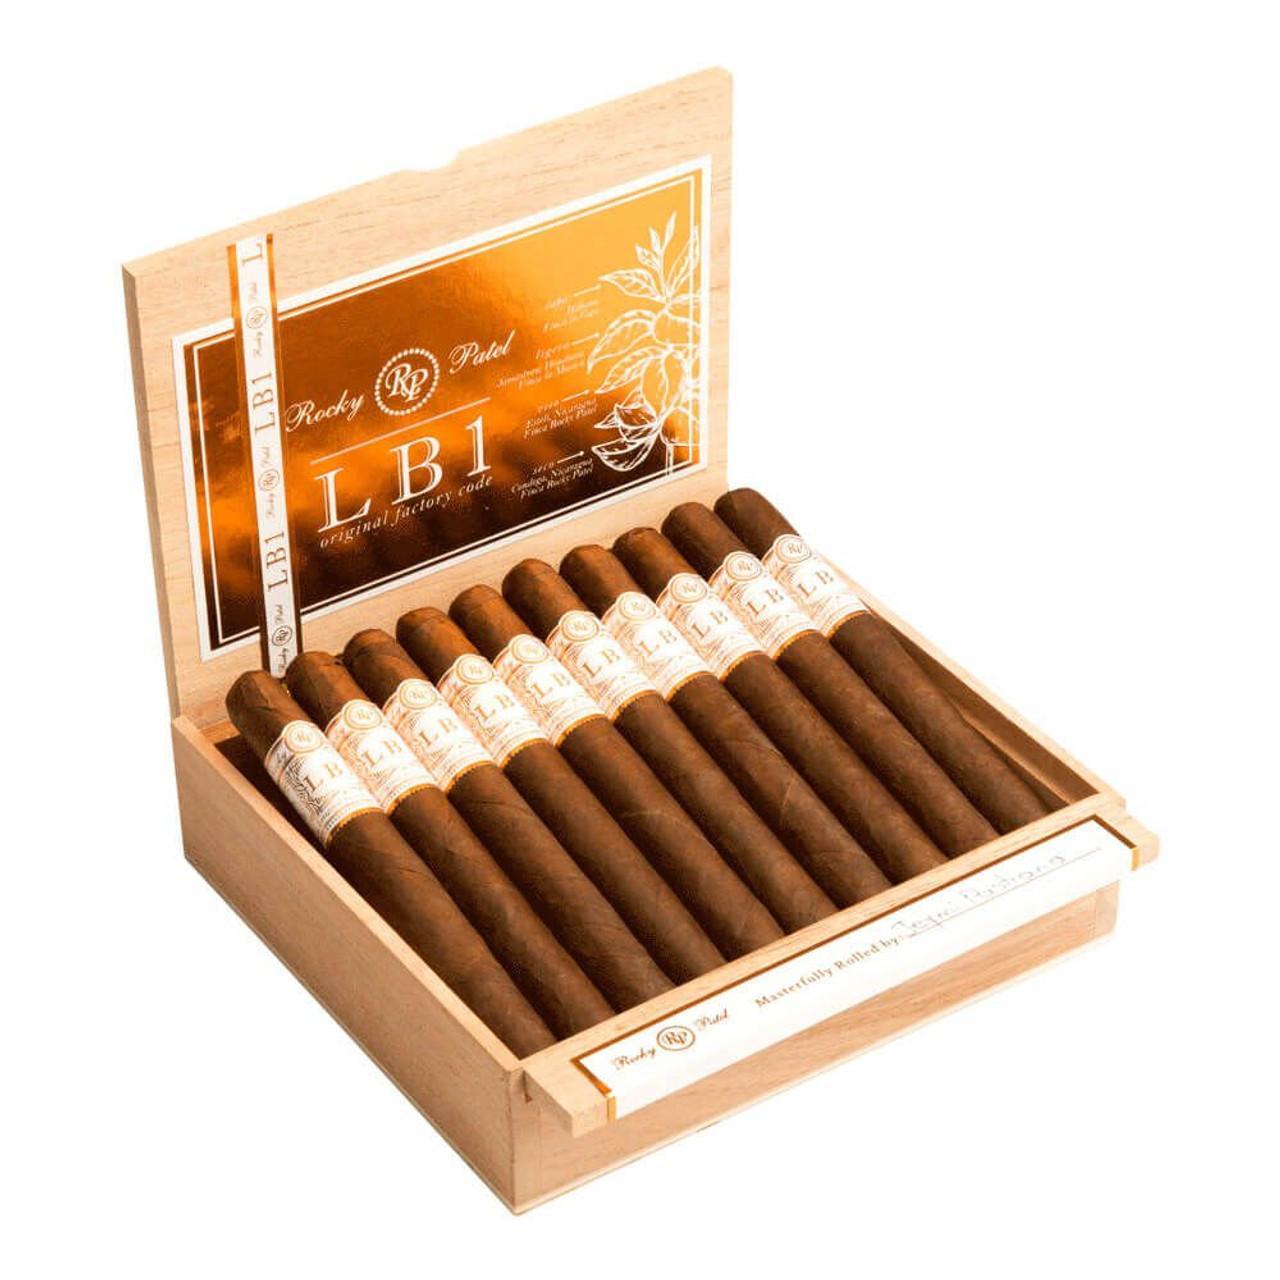 Rocky Patel LB1 Toro Cigars - 6.5 x 52 (Box of 20)